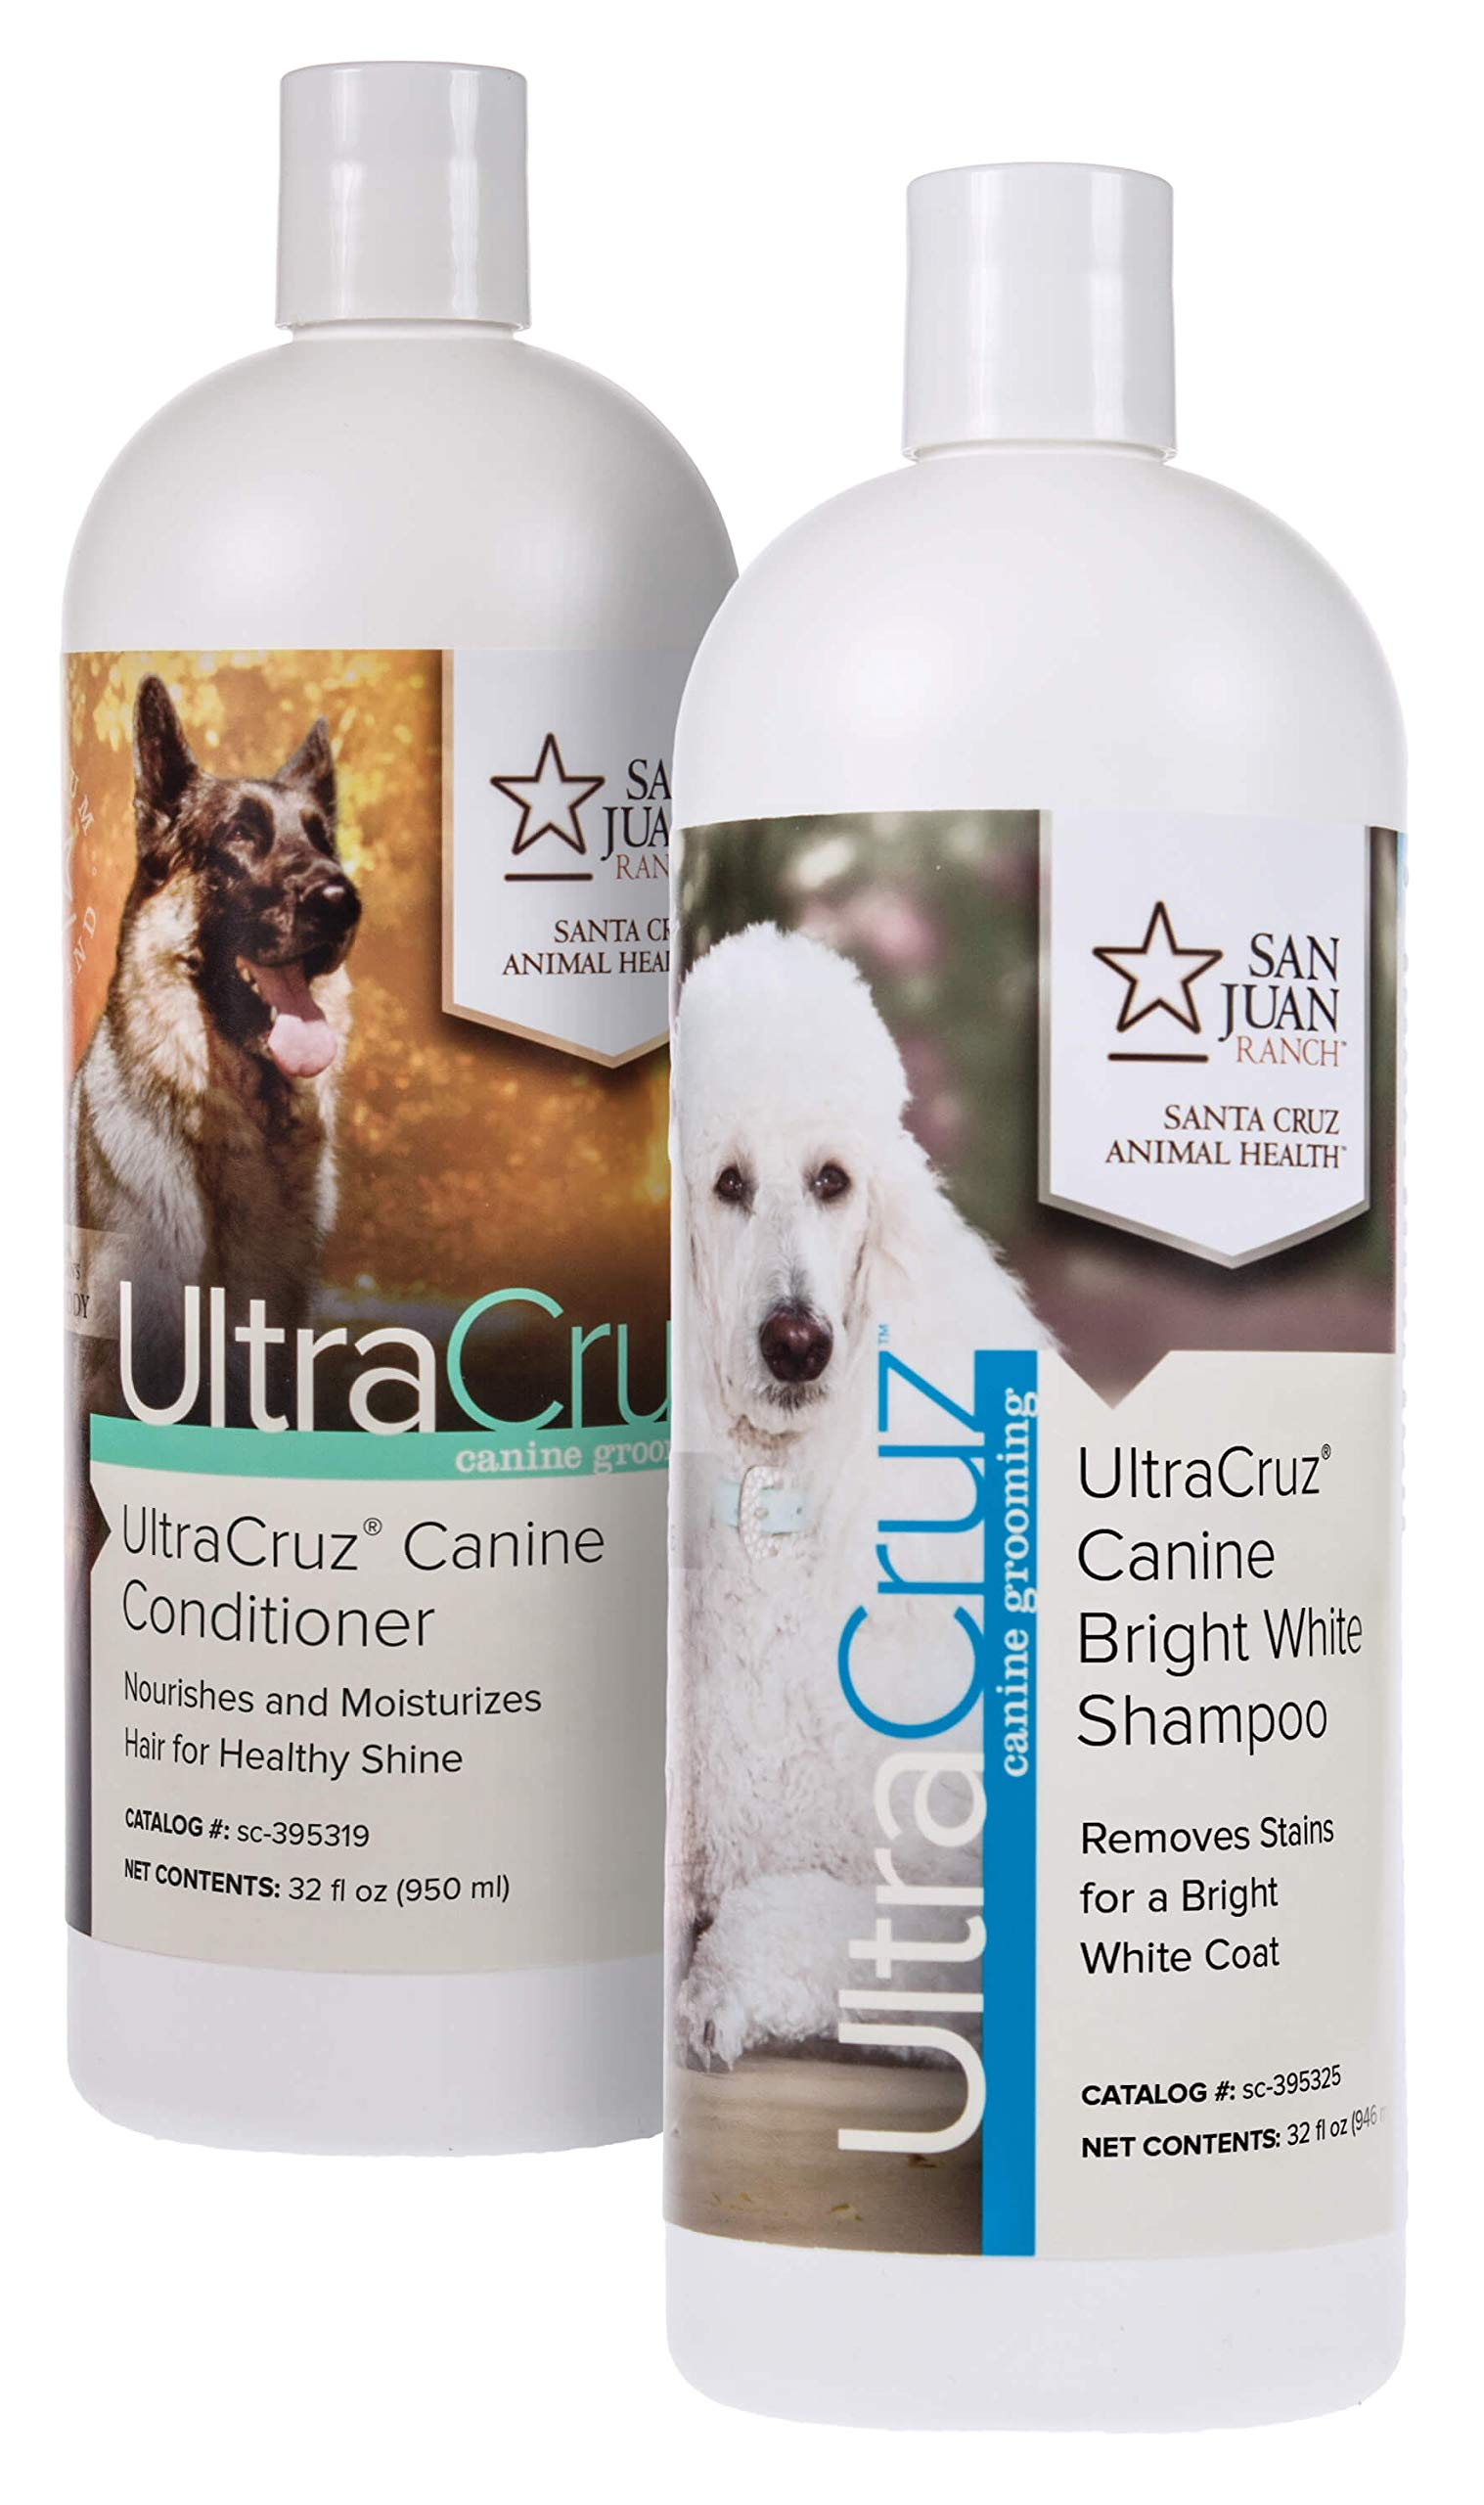 UltraCruz Canine Bright White Dog Shampoo and Conditioner Bundle, 32 oz Each by UltraCruz